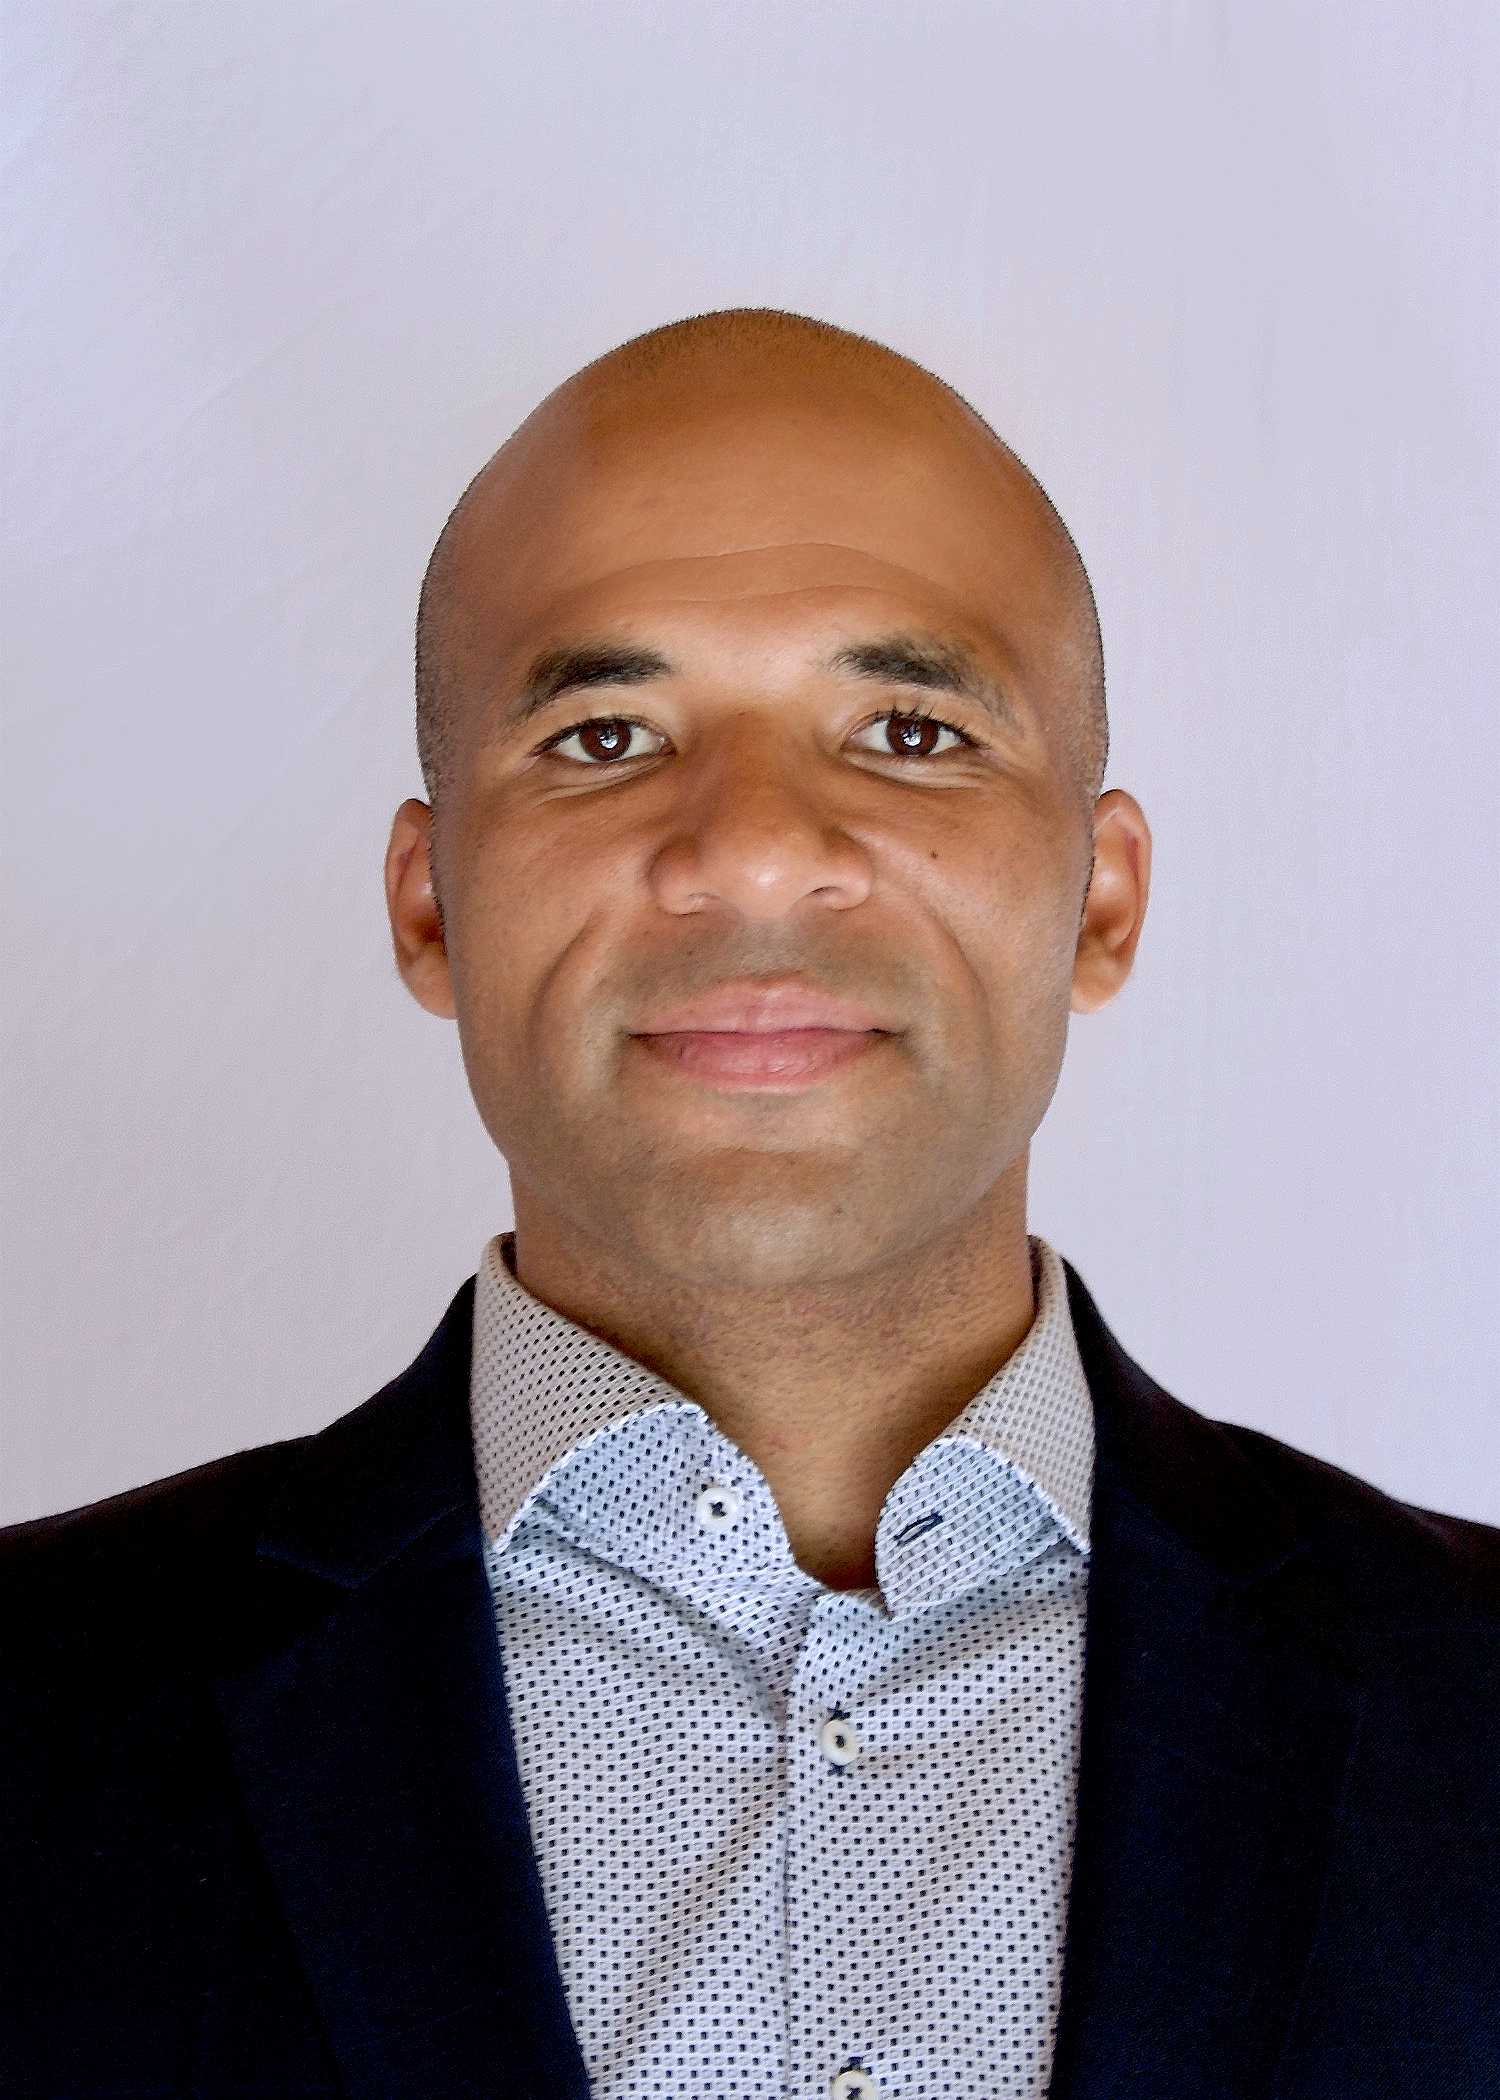 Akwasi Owusu-Bempah, Assistant Professor, Department of Sociology, University of Toronto